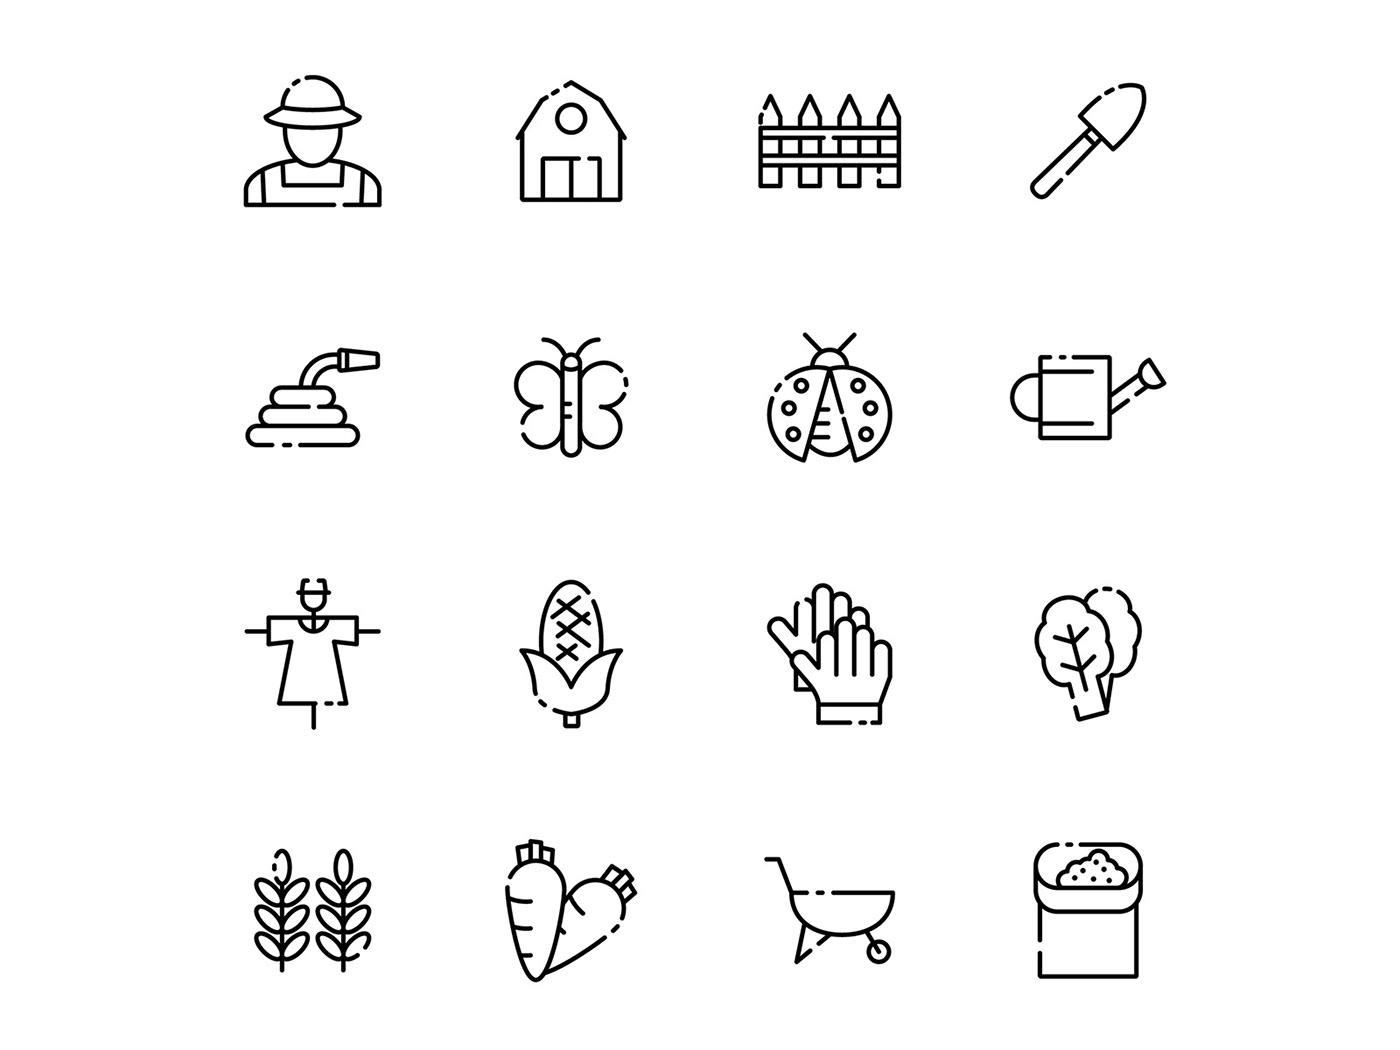 farm farm icon Farm vector freebie icon design  icons download icons pack icons set vector design vector icon